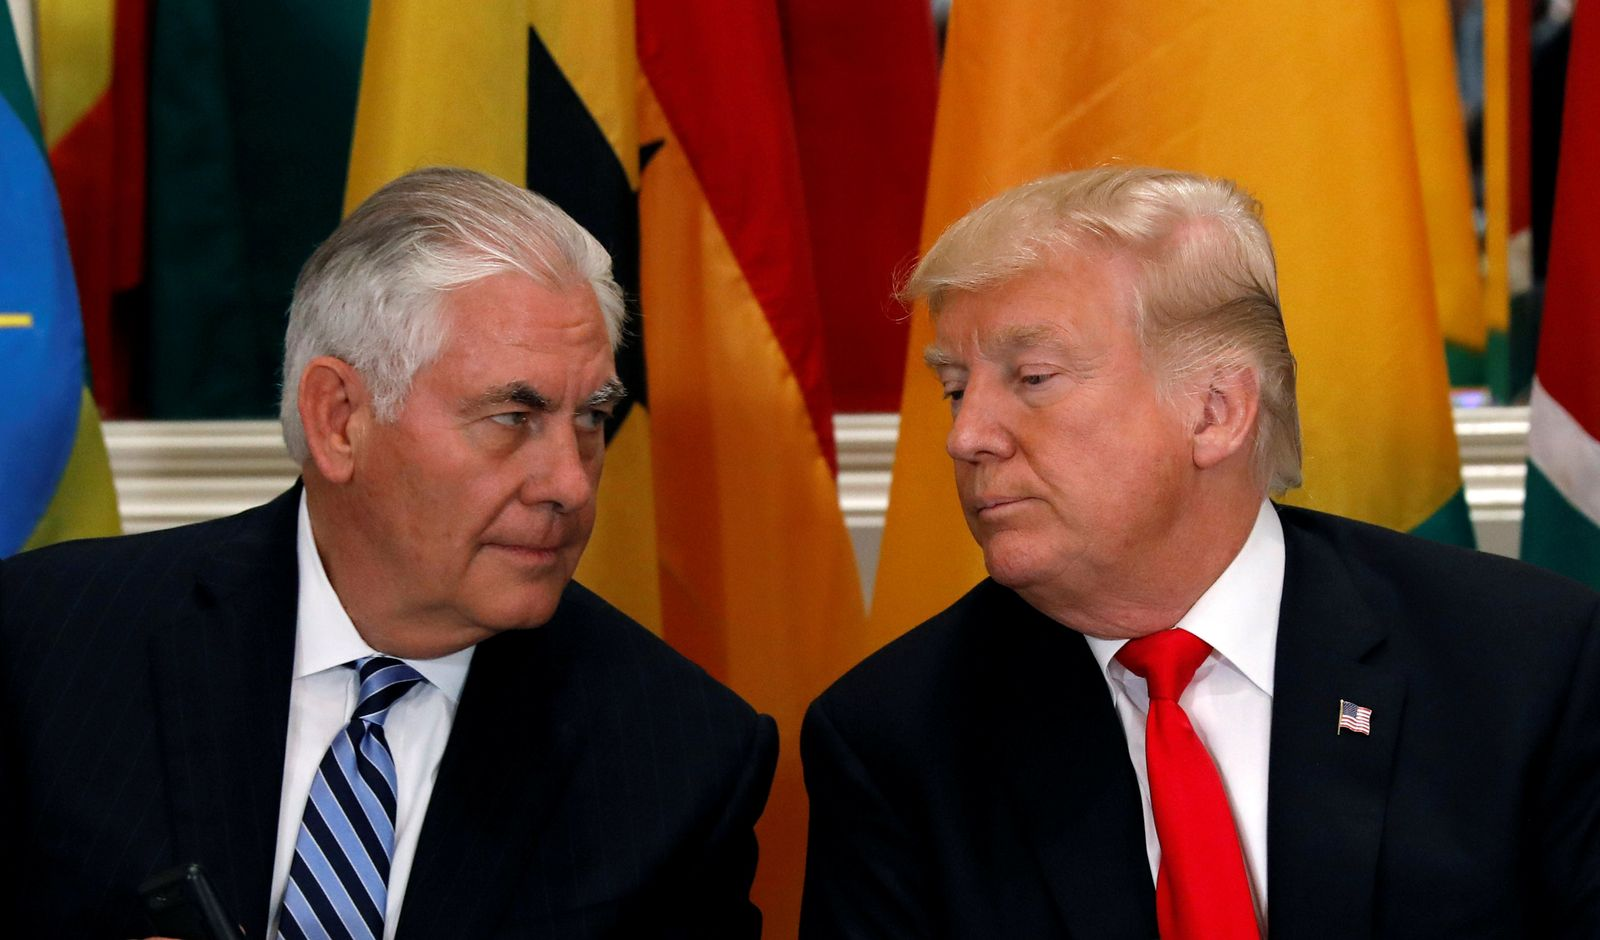 Tillerson/ Trump